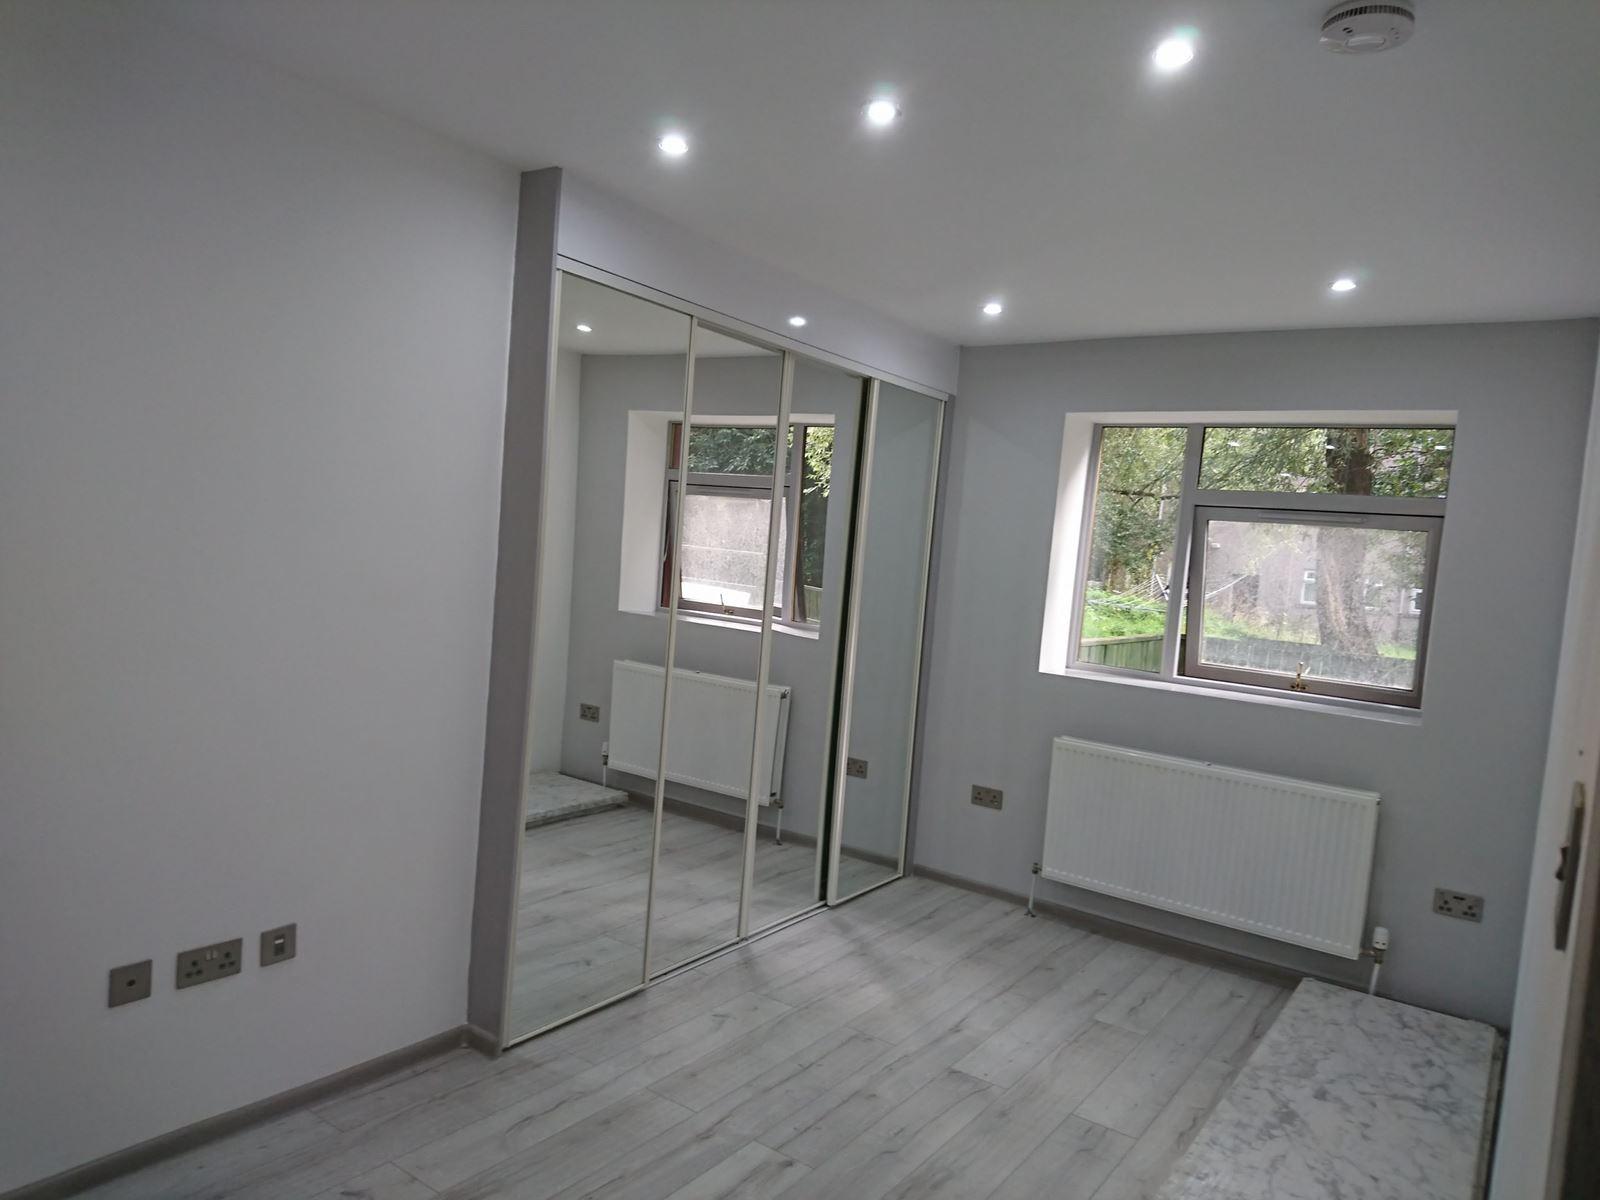 plastering-contractors-edinburgh--plastering-companies-edinburgh